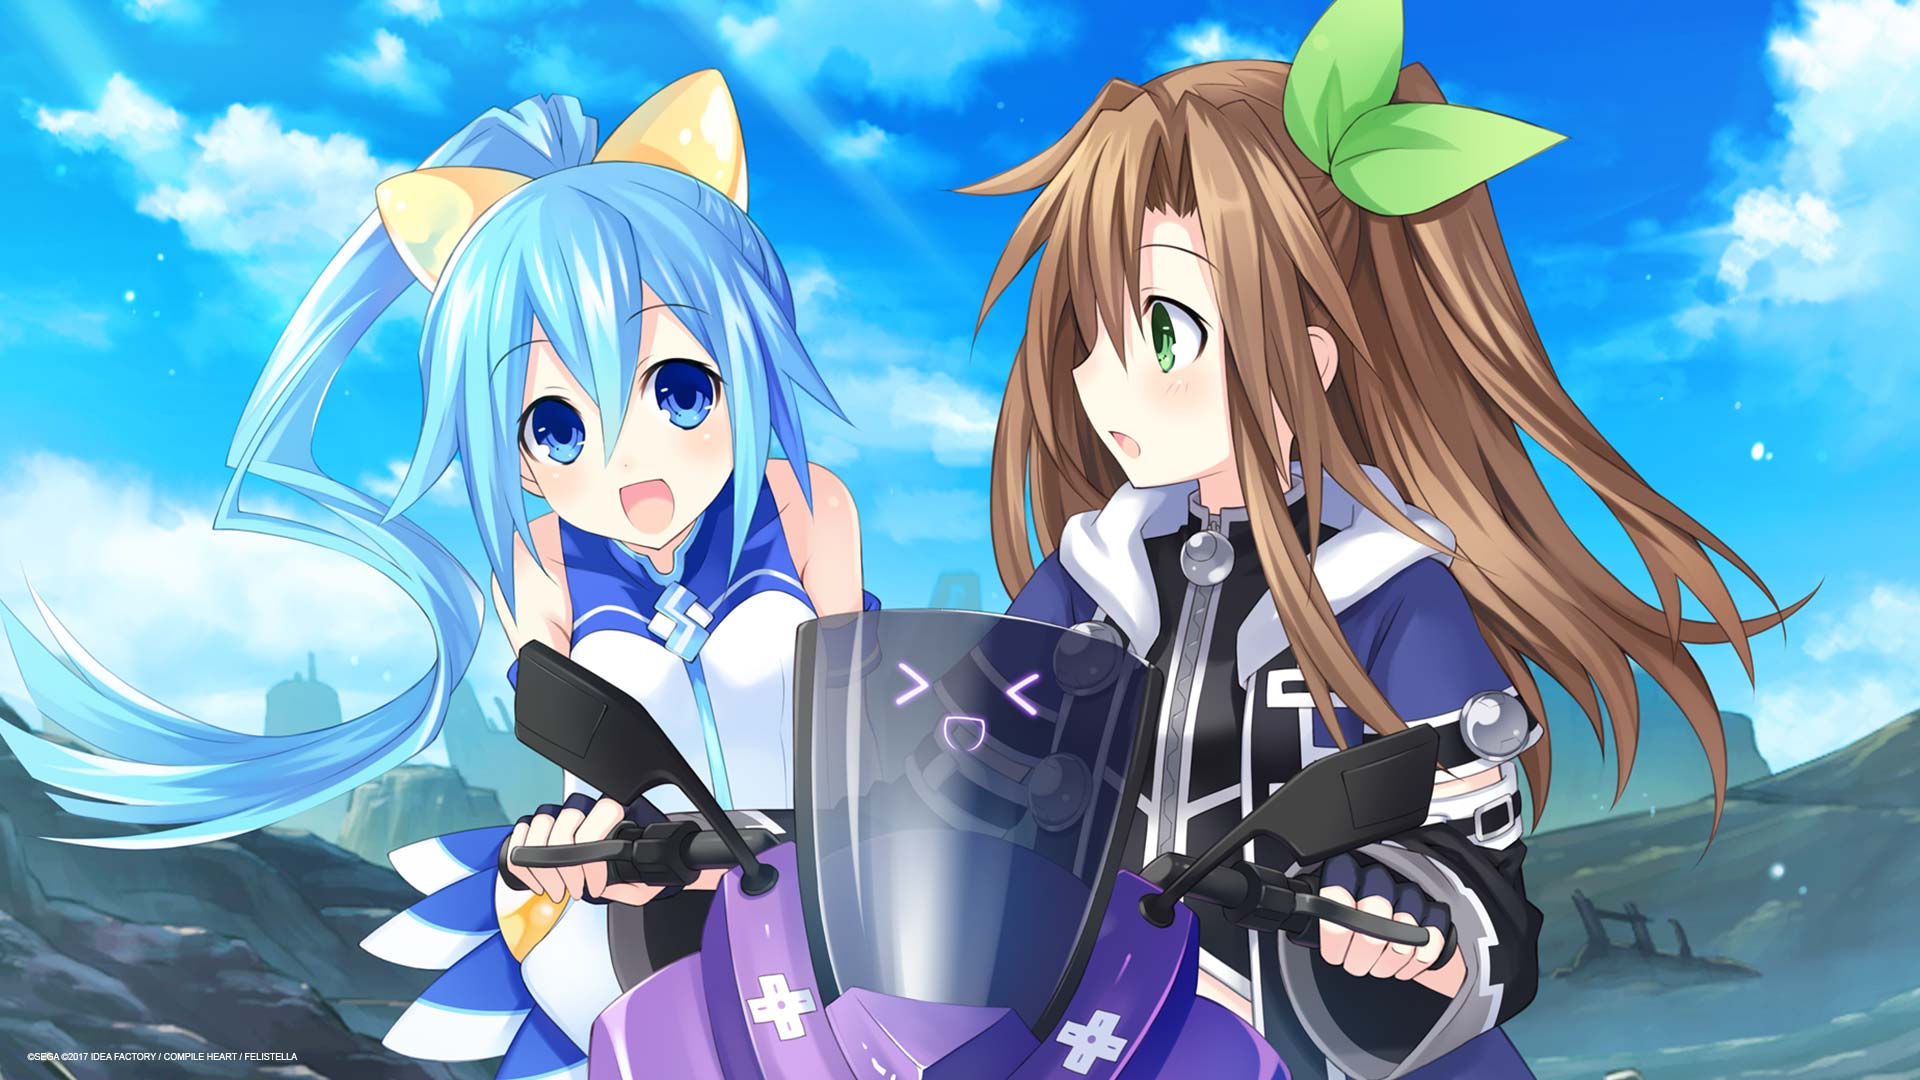 Superdimension Neptune vs SEGA Hard Girls Wallpaper 010 – Segami & IF